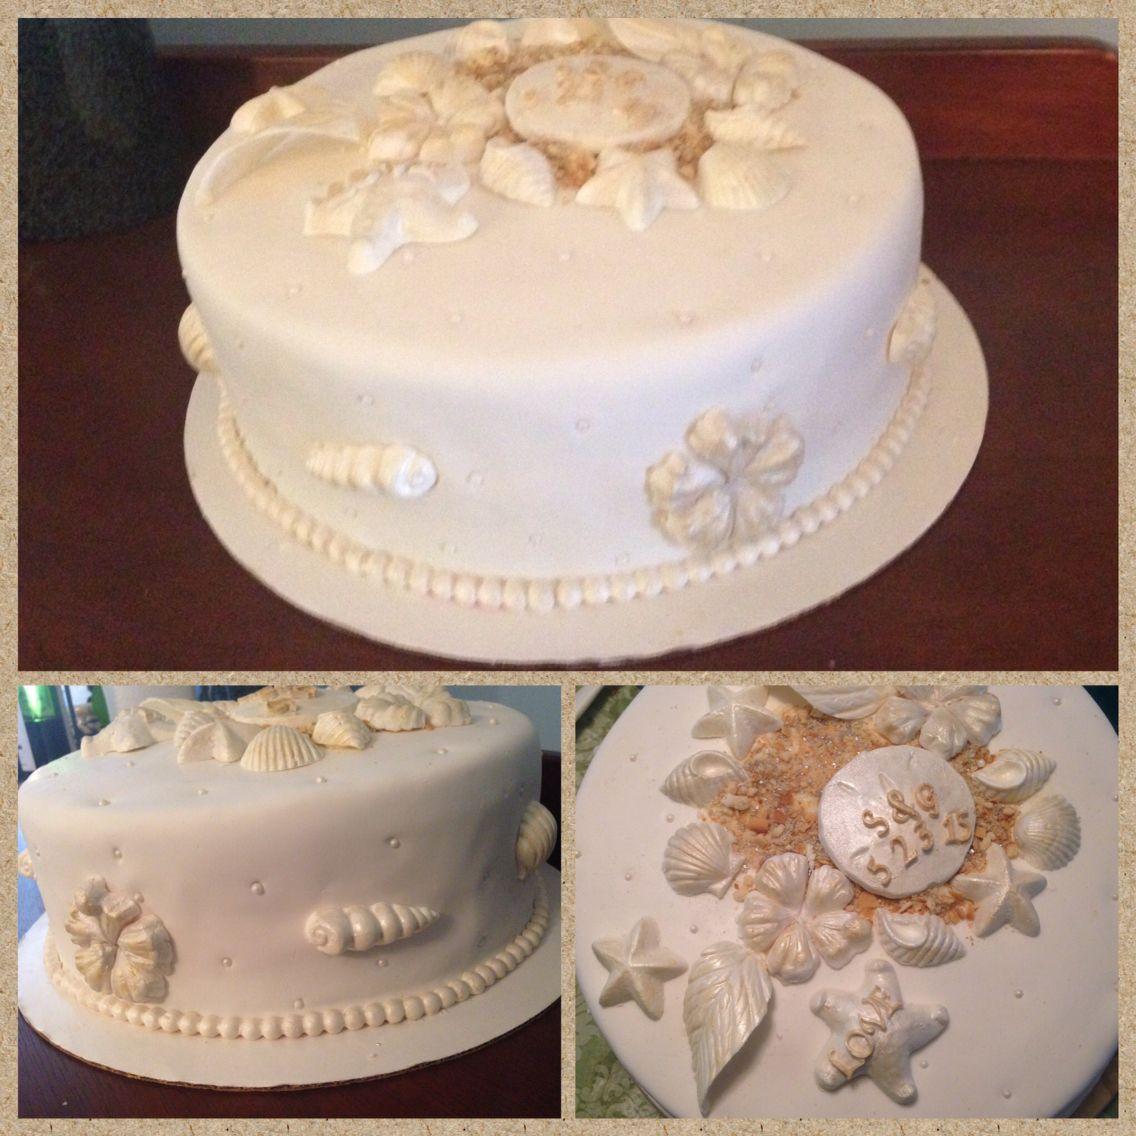 BEACHY Bridal shower cake by Po-Zi Designs